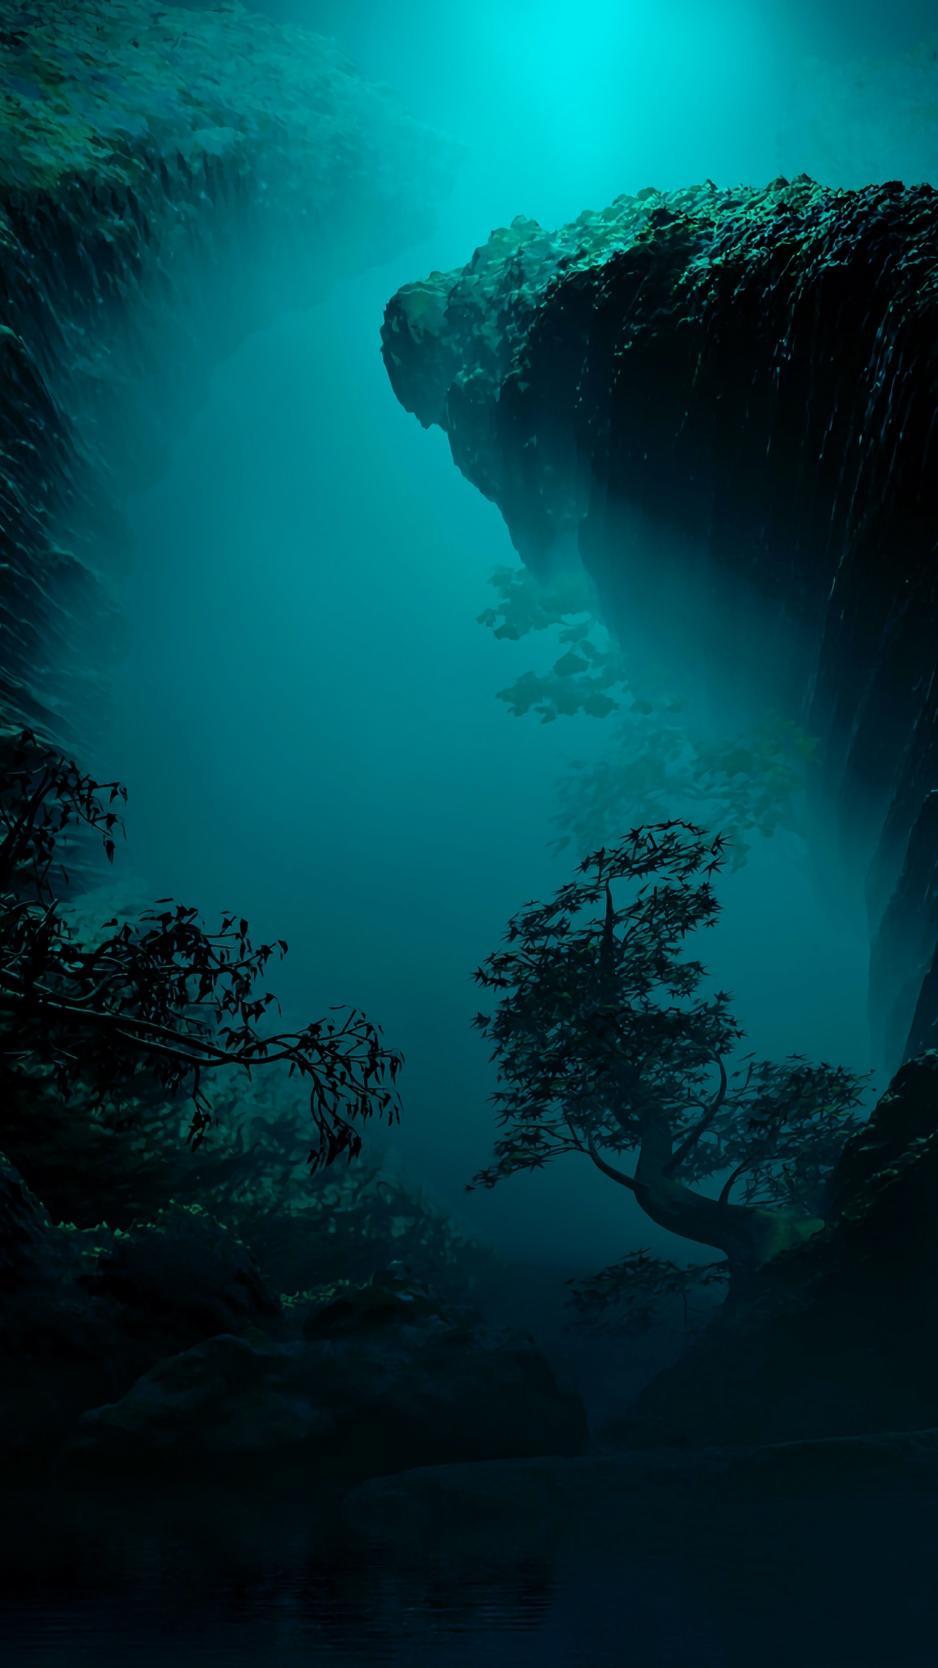 Underwater Caves Wallpapers Wallpaper Cave